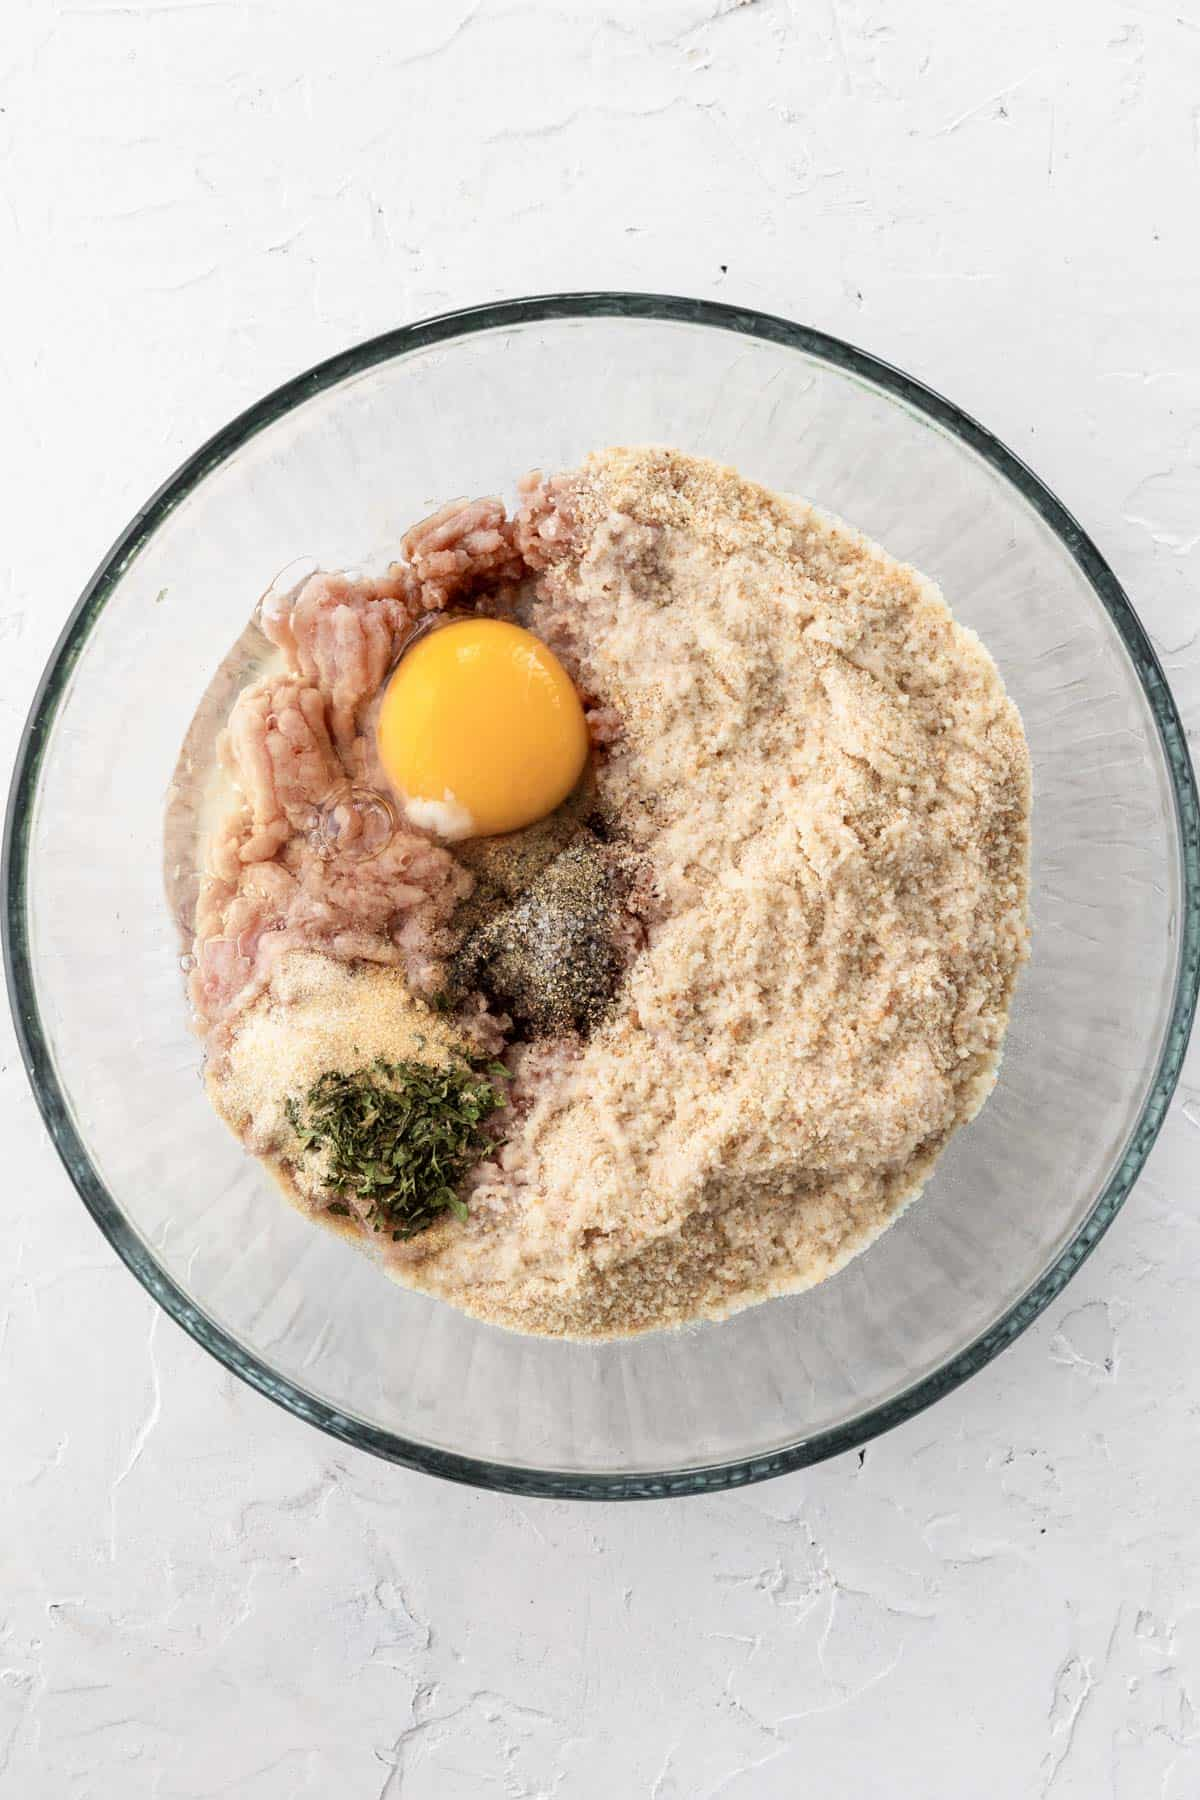 Turkey meatball ingredients in a glass bowl.